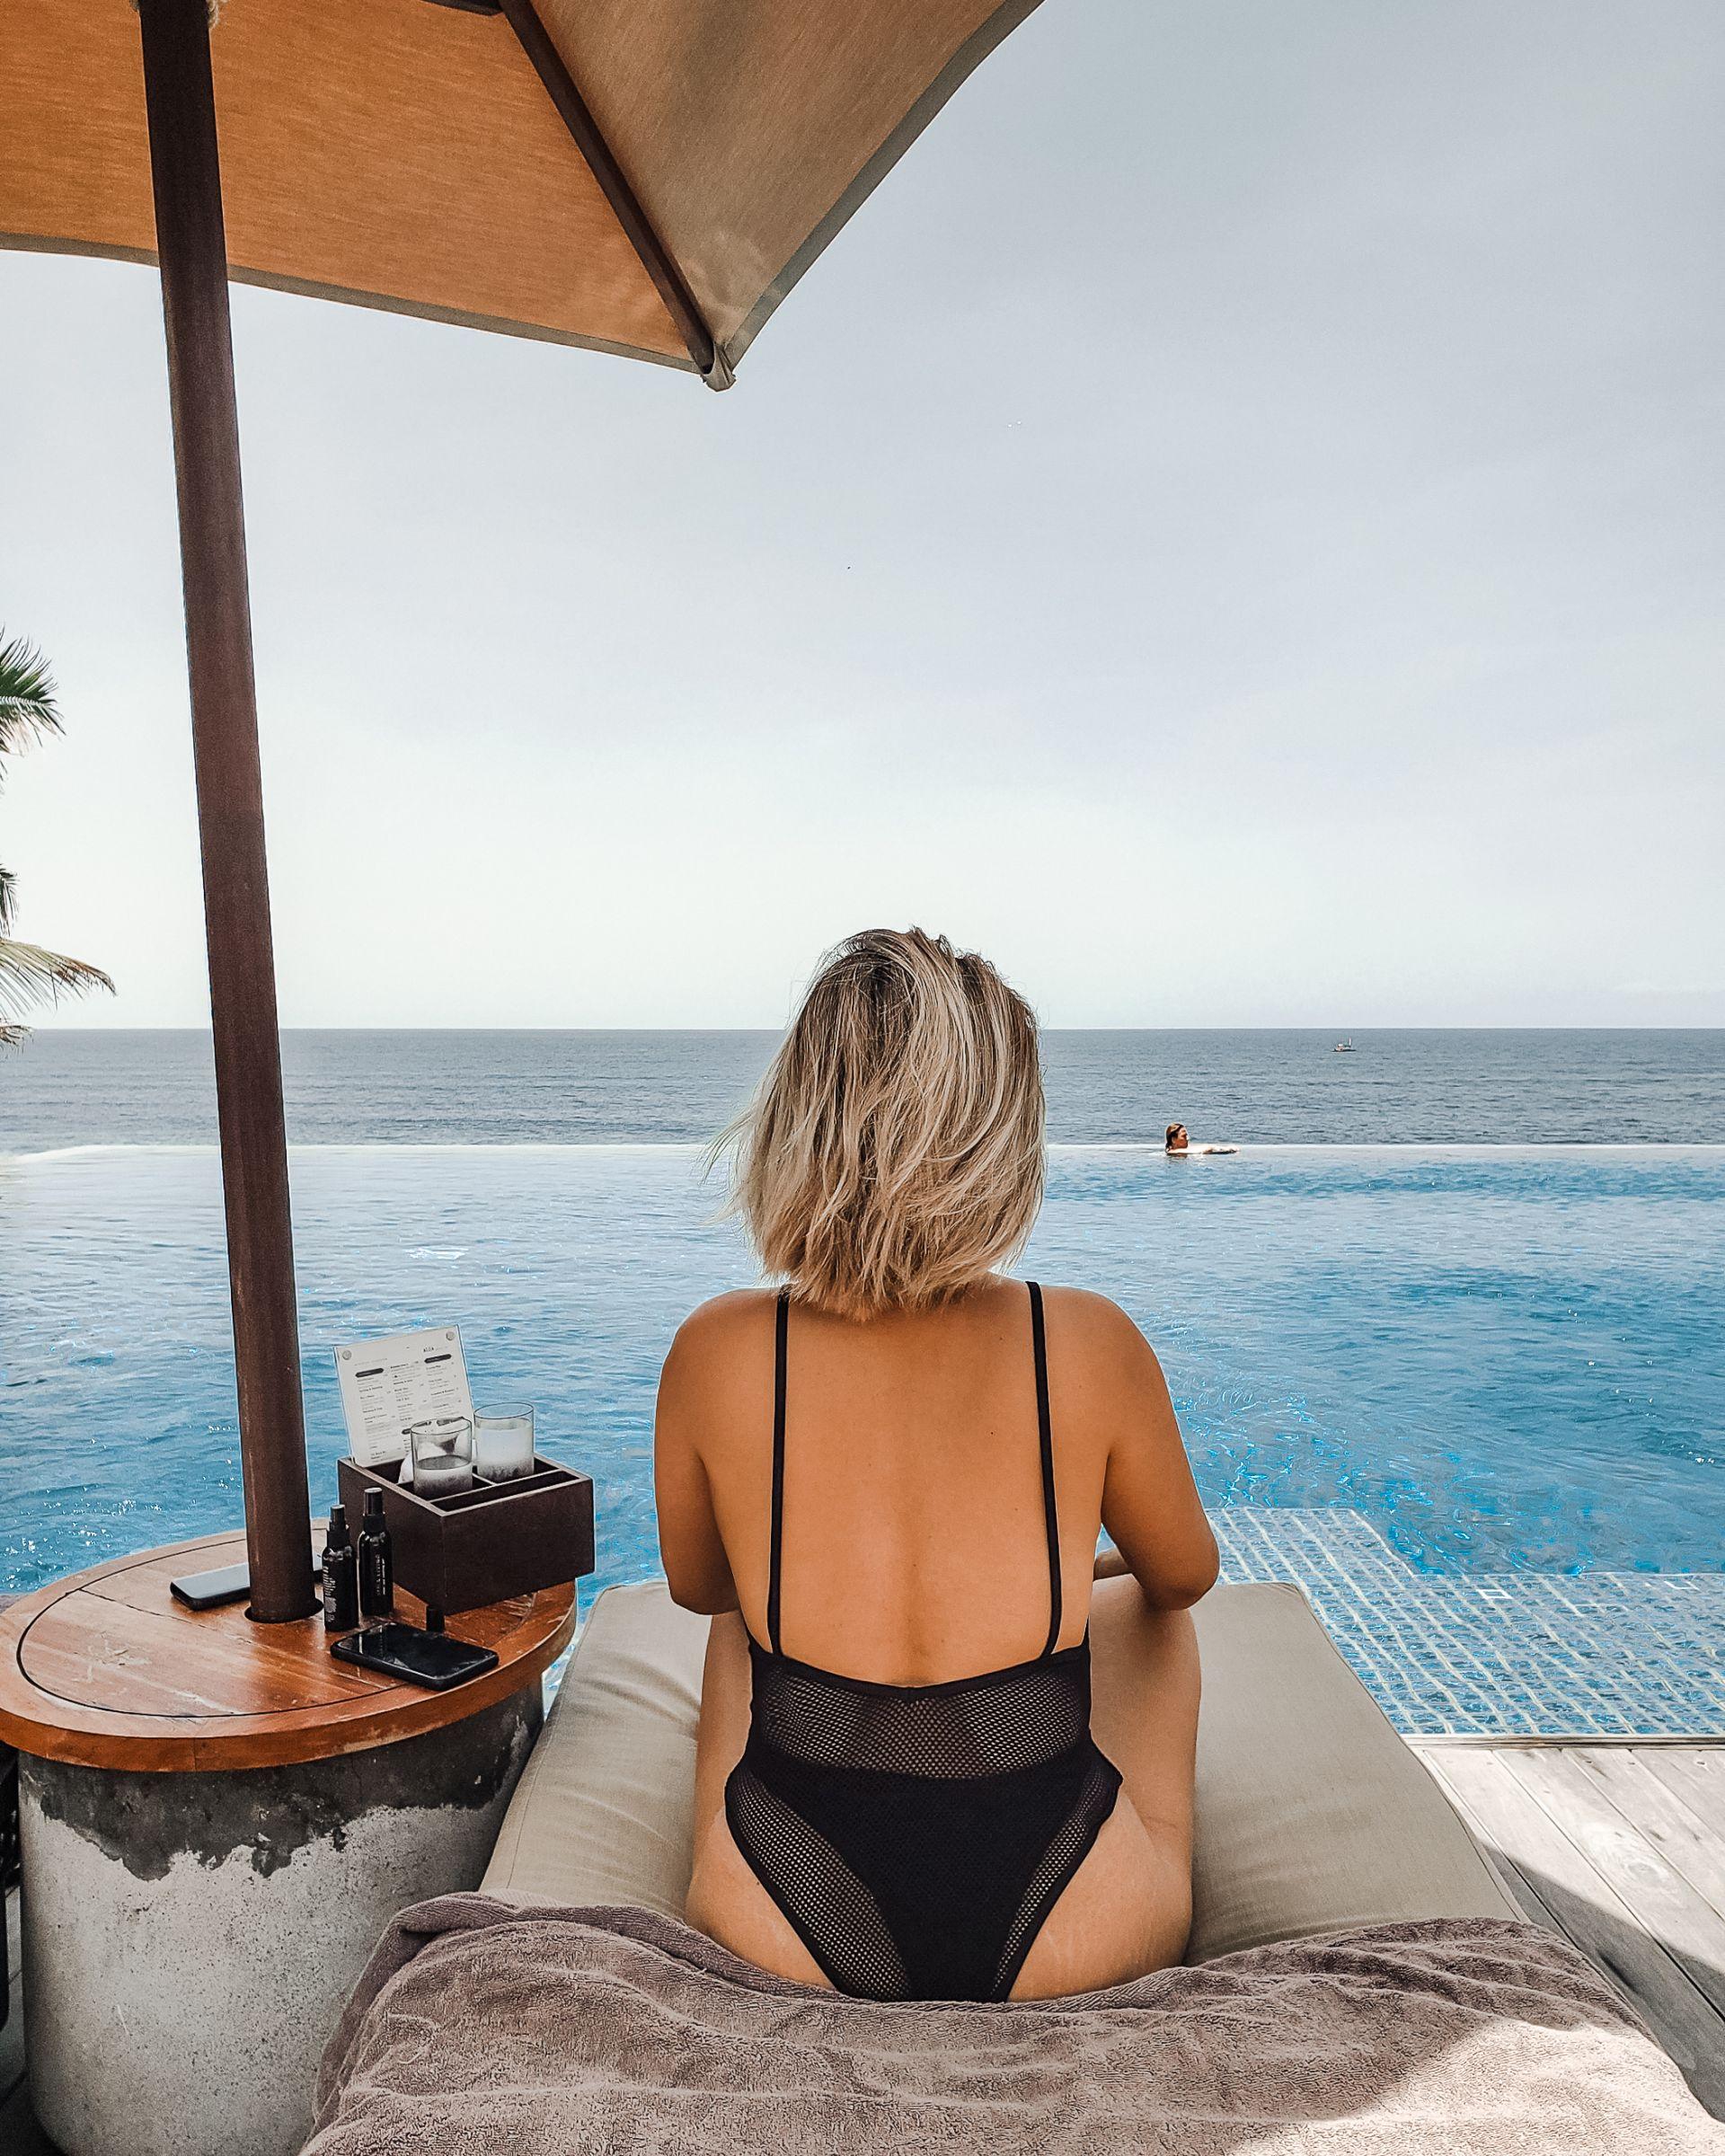 alila hotel infinity pool